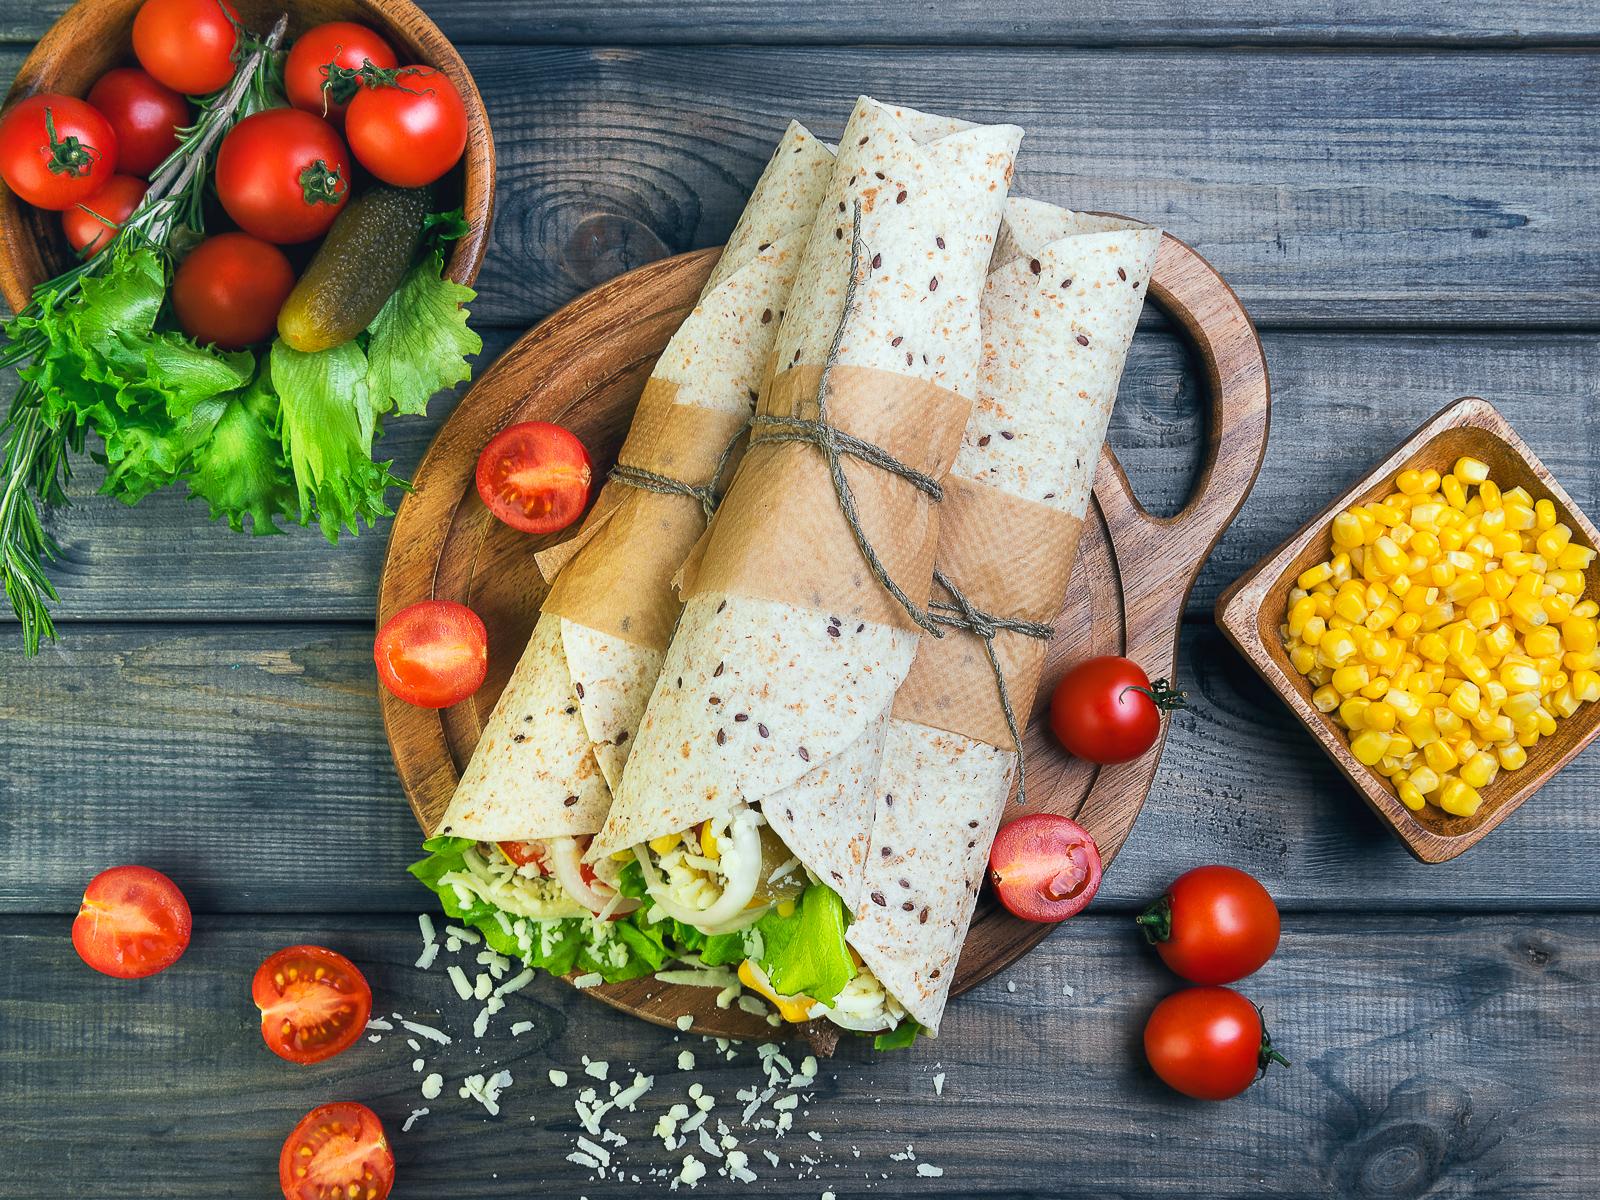 Доставка еды краснодар деливери клаб